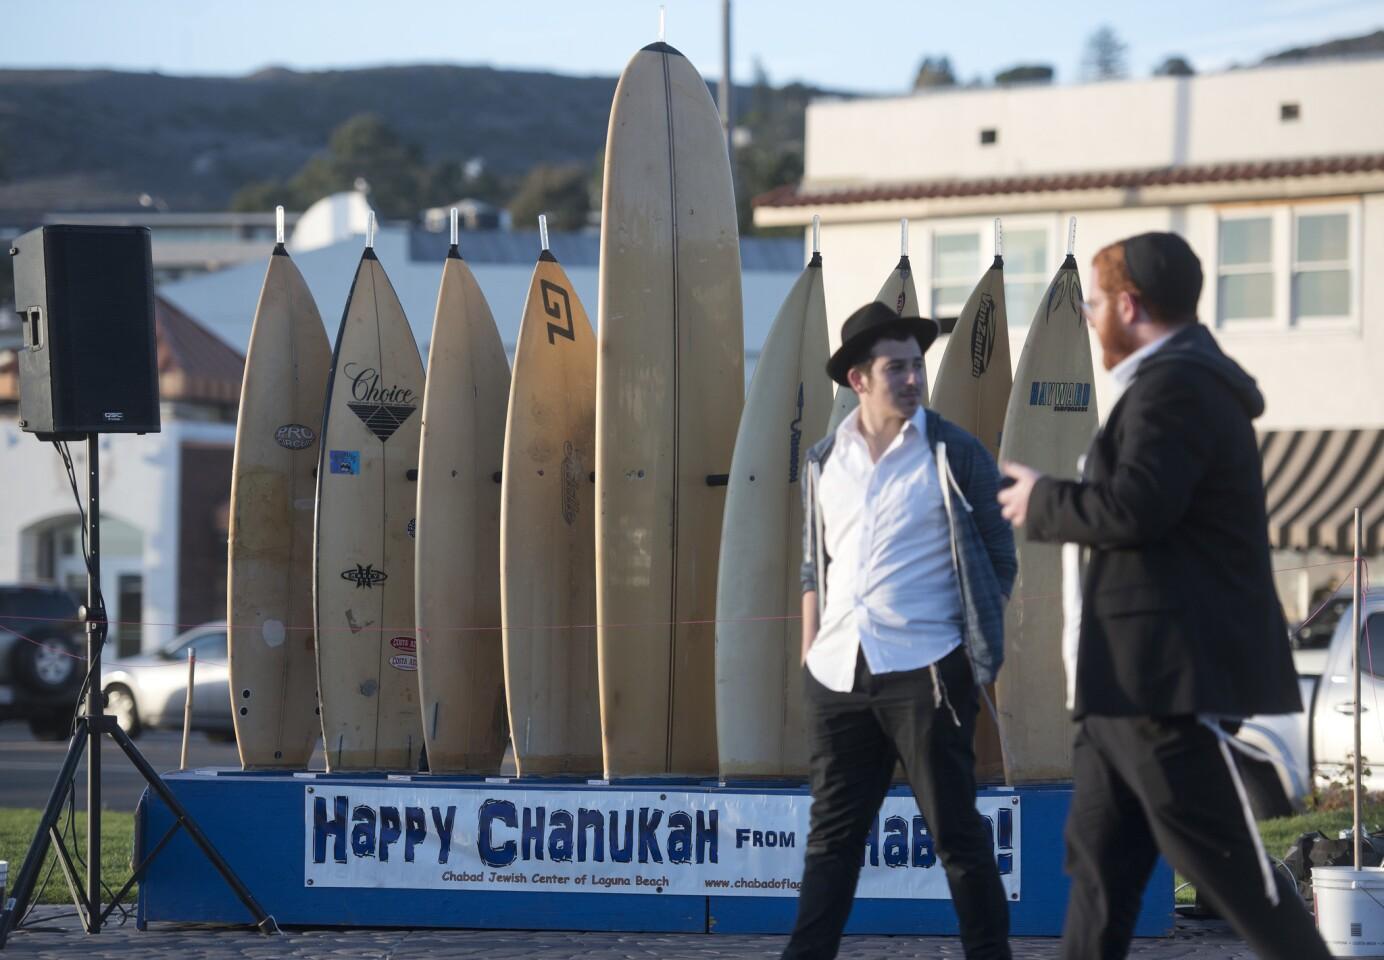 tn-dpt-me-surfboard-menorah-gallery-20181203-001